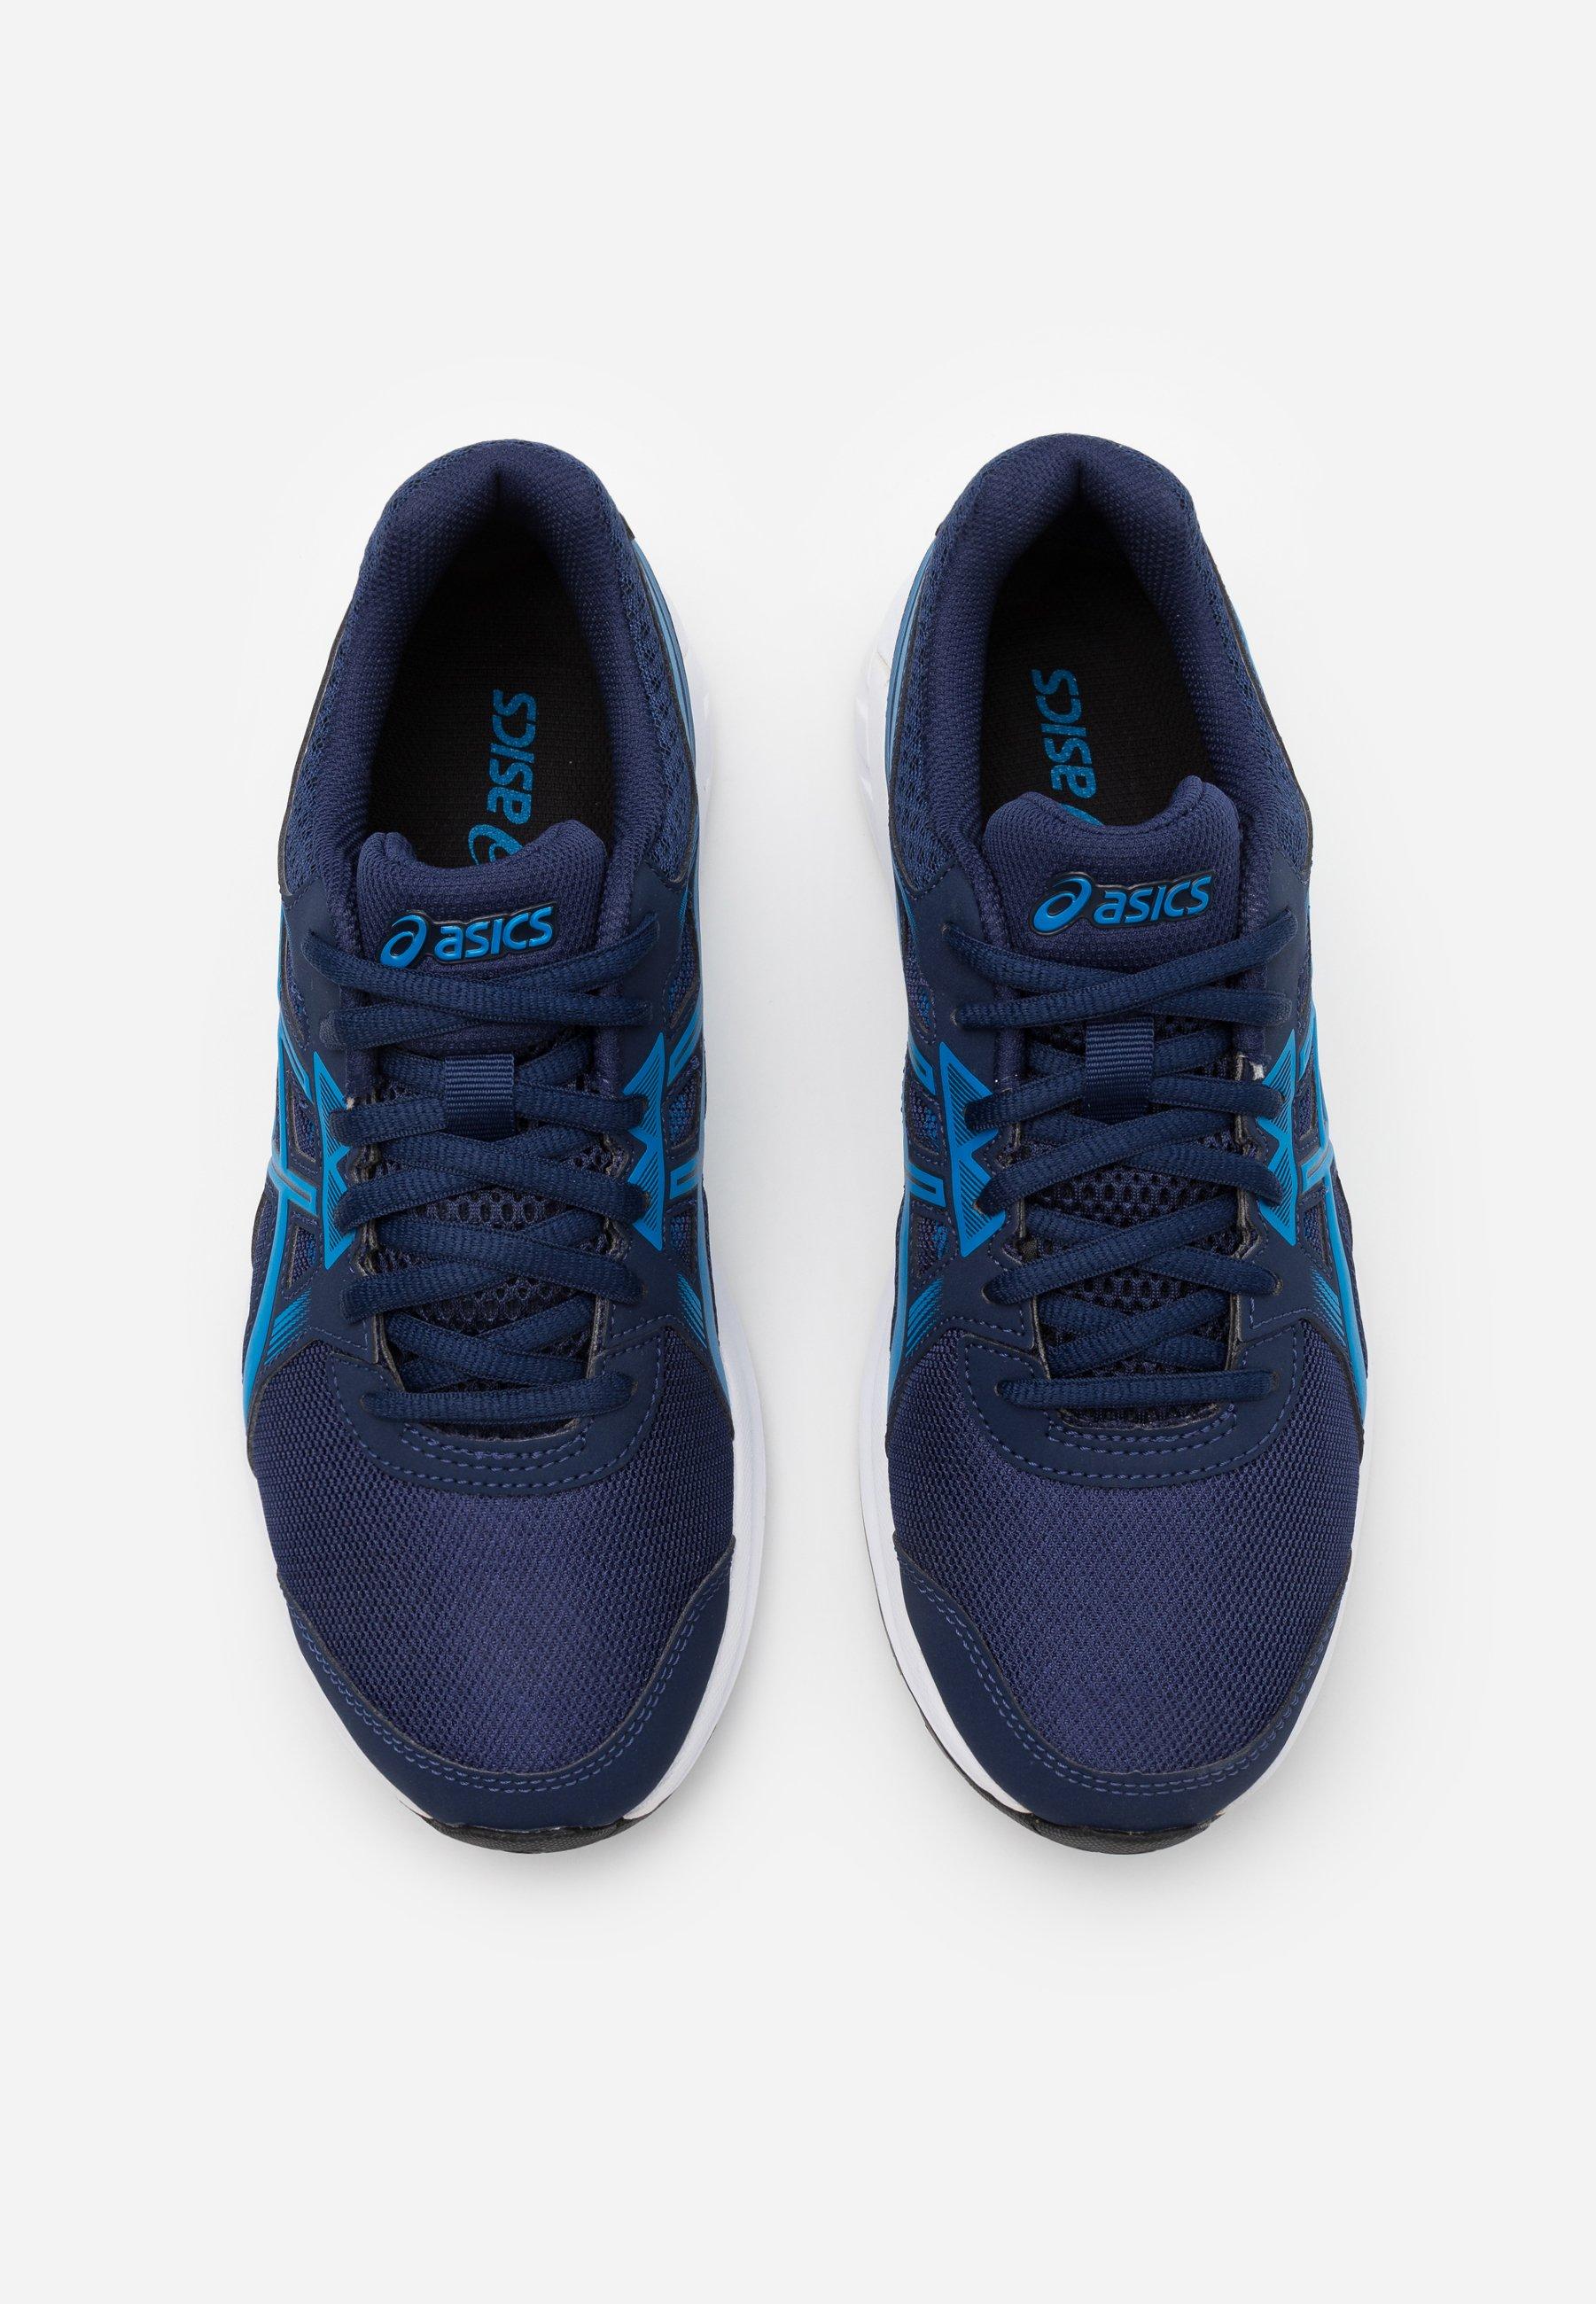 Asics Gel-sileo 2 - Hardloopschoenen Neutraal Peacoat/electric Blue Goedkope Schoenen